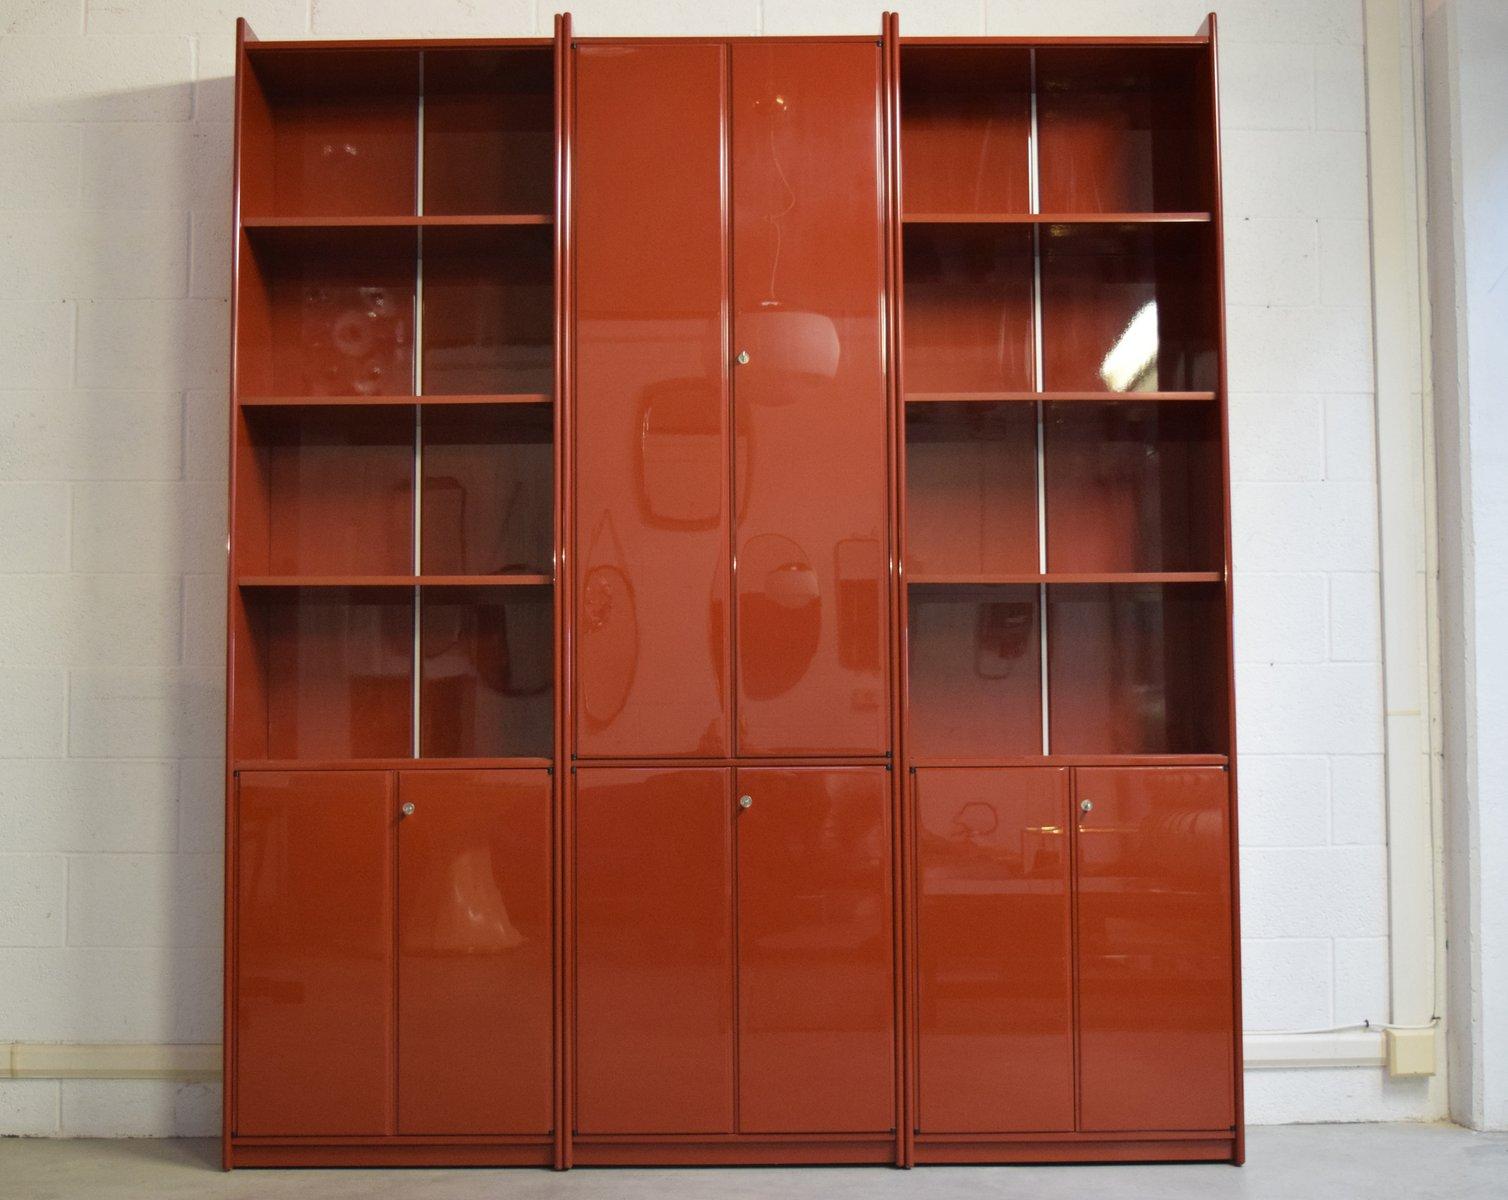 Libreria olinto di kazuhide takahama per b b como for B b italia novedrate